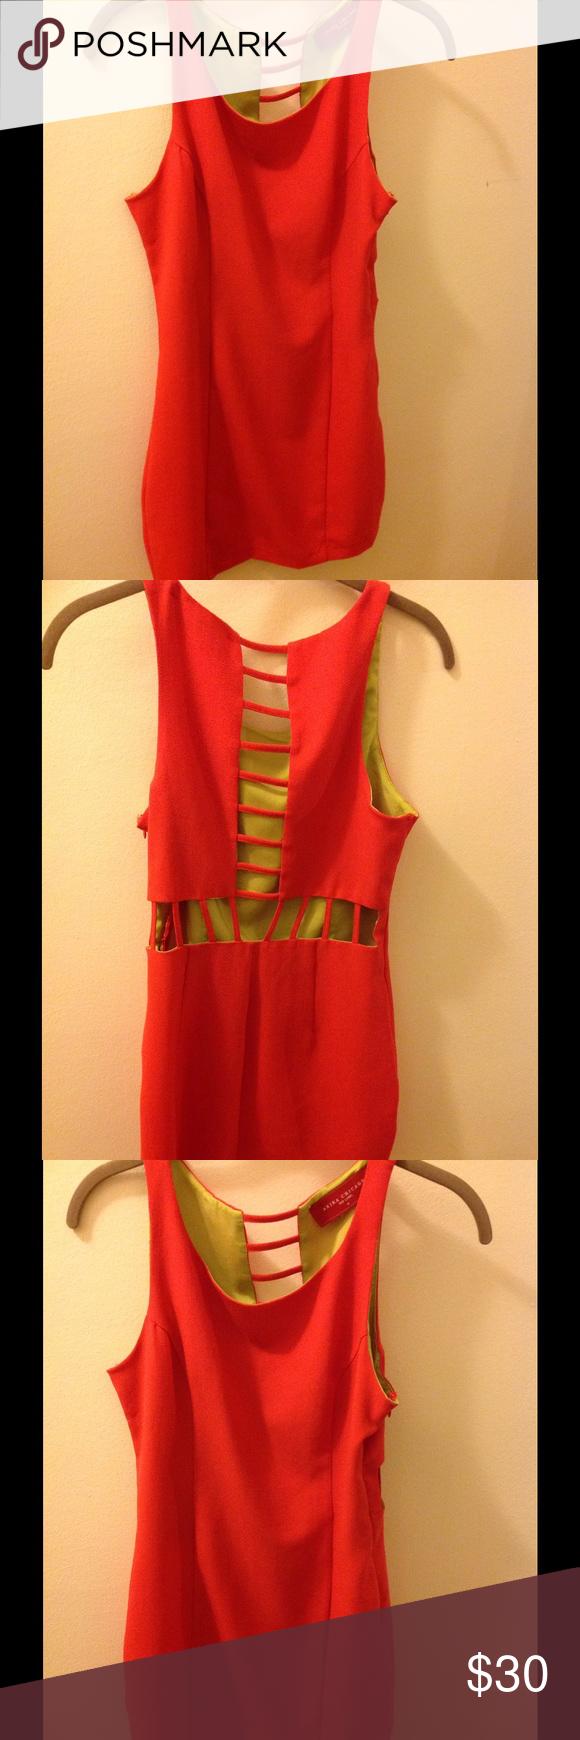 Akira Chicago Red Label : akira, chicago, label, Akira, Label, Chicago, Dress, Label,, Clothes, Design,, Dresses